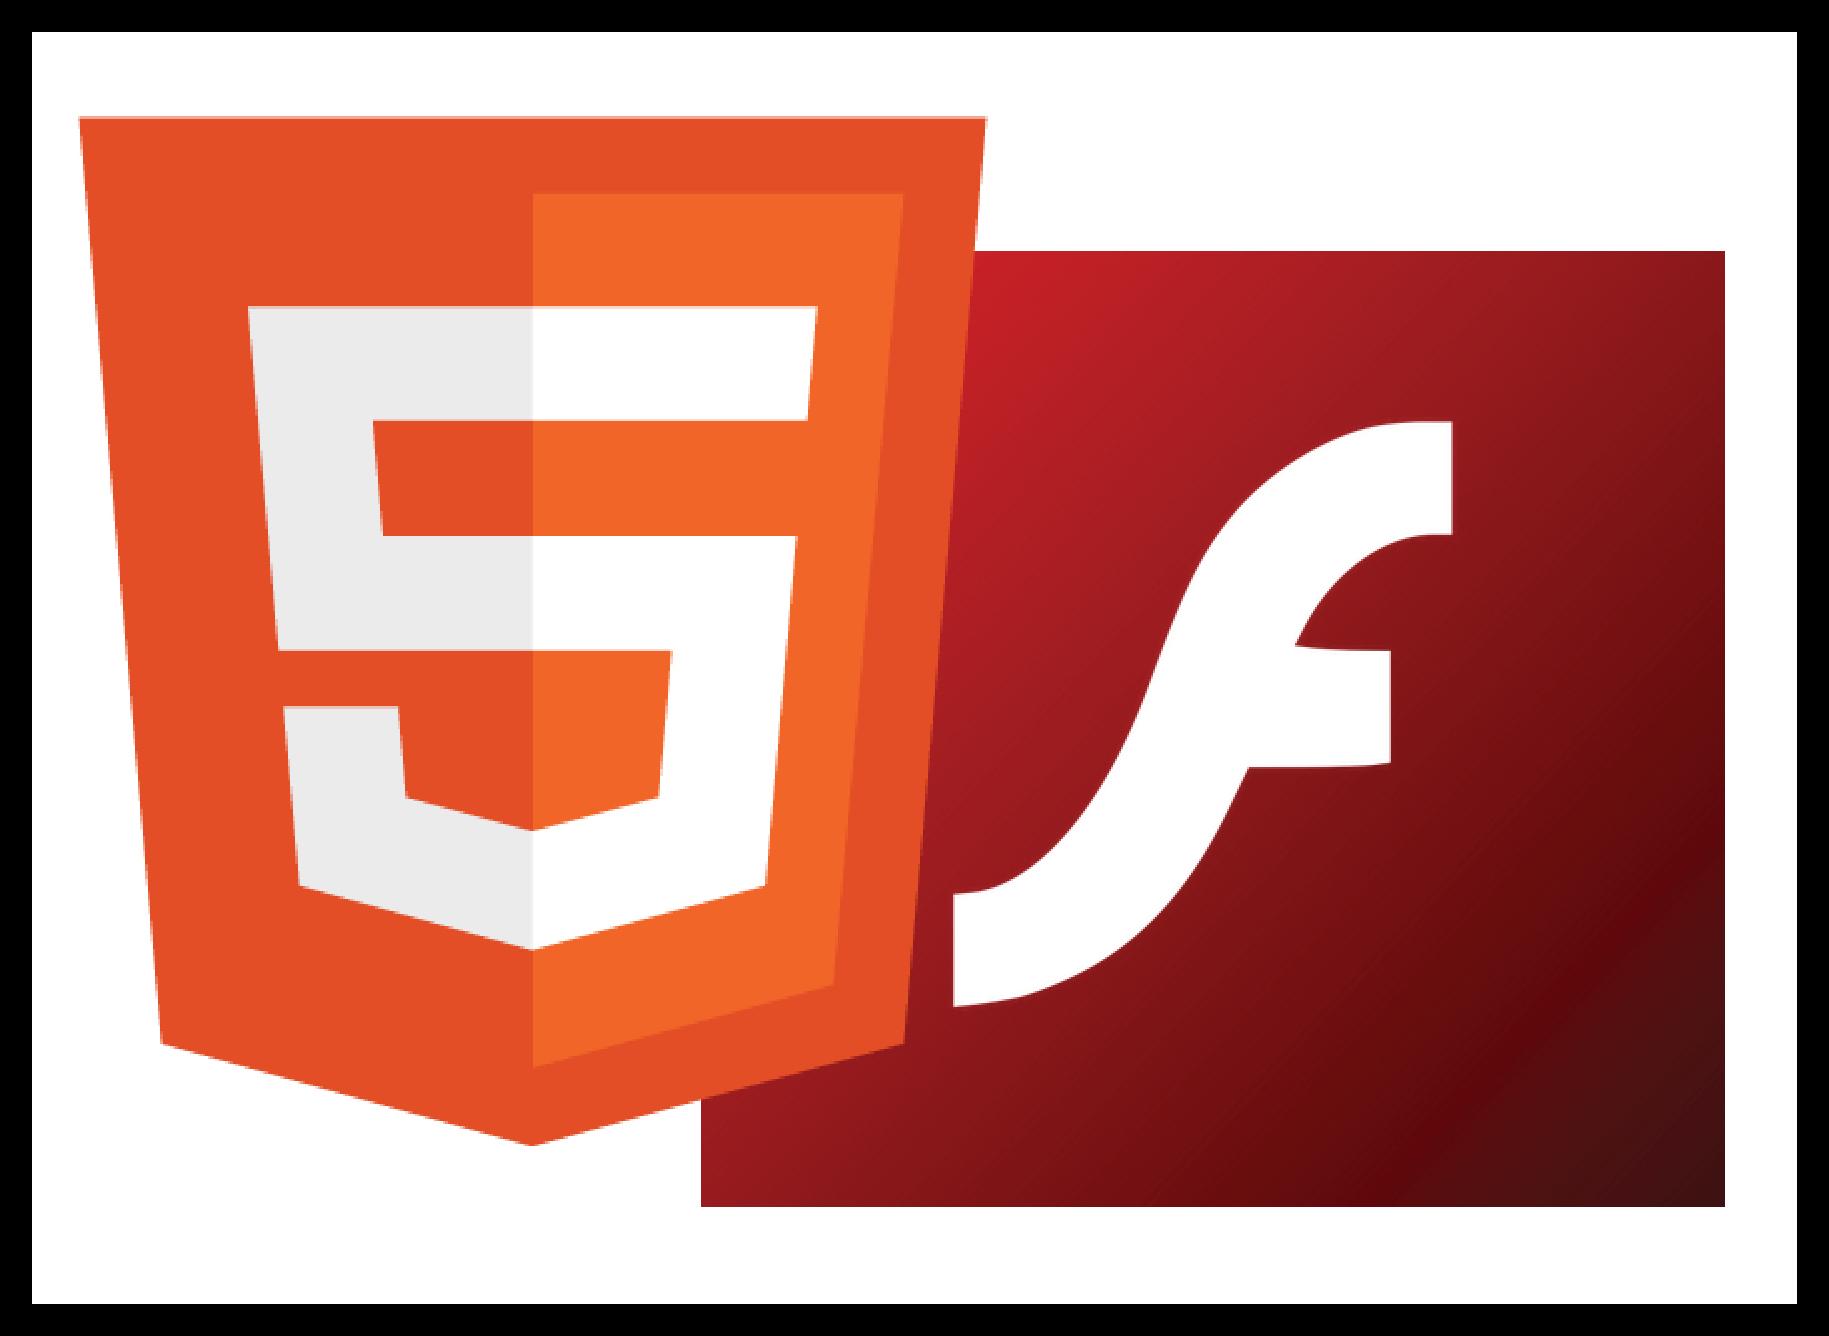 Картинка HTML5 и Adobe Flash Player